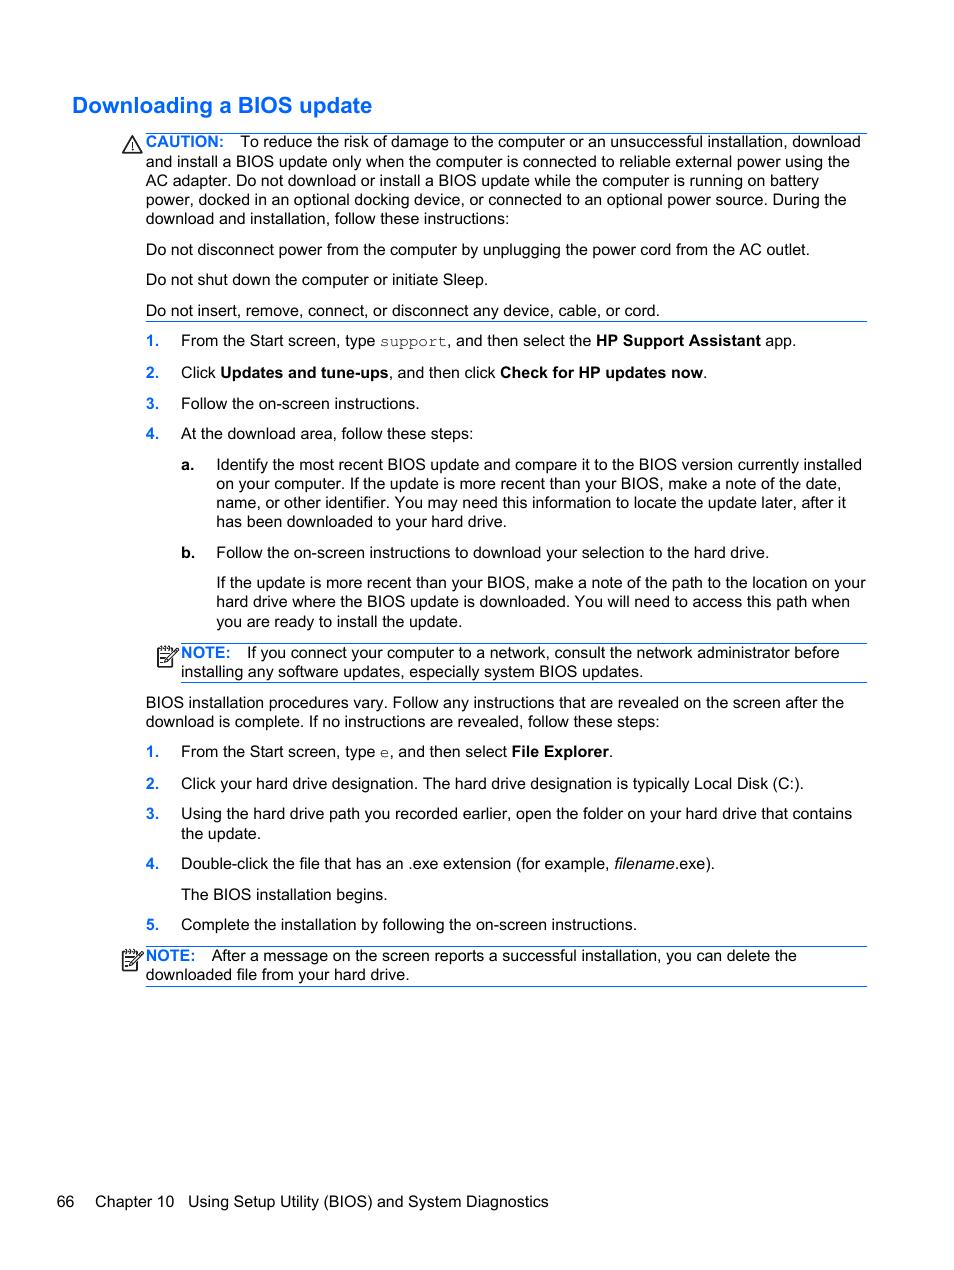 Downloading a bios update | HP Pavilion 15-e043cl Notebook